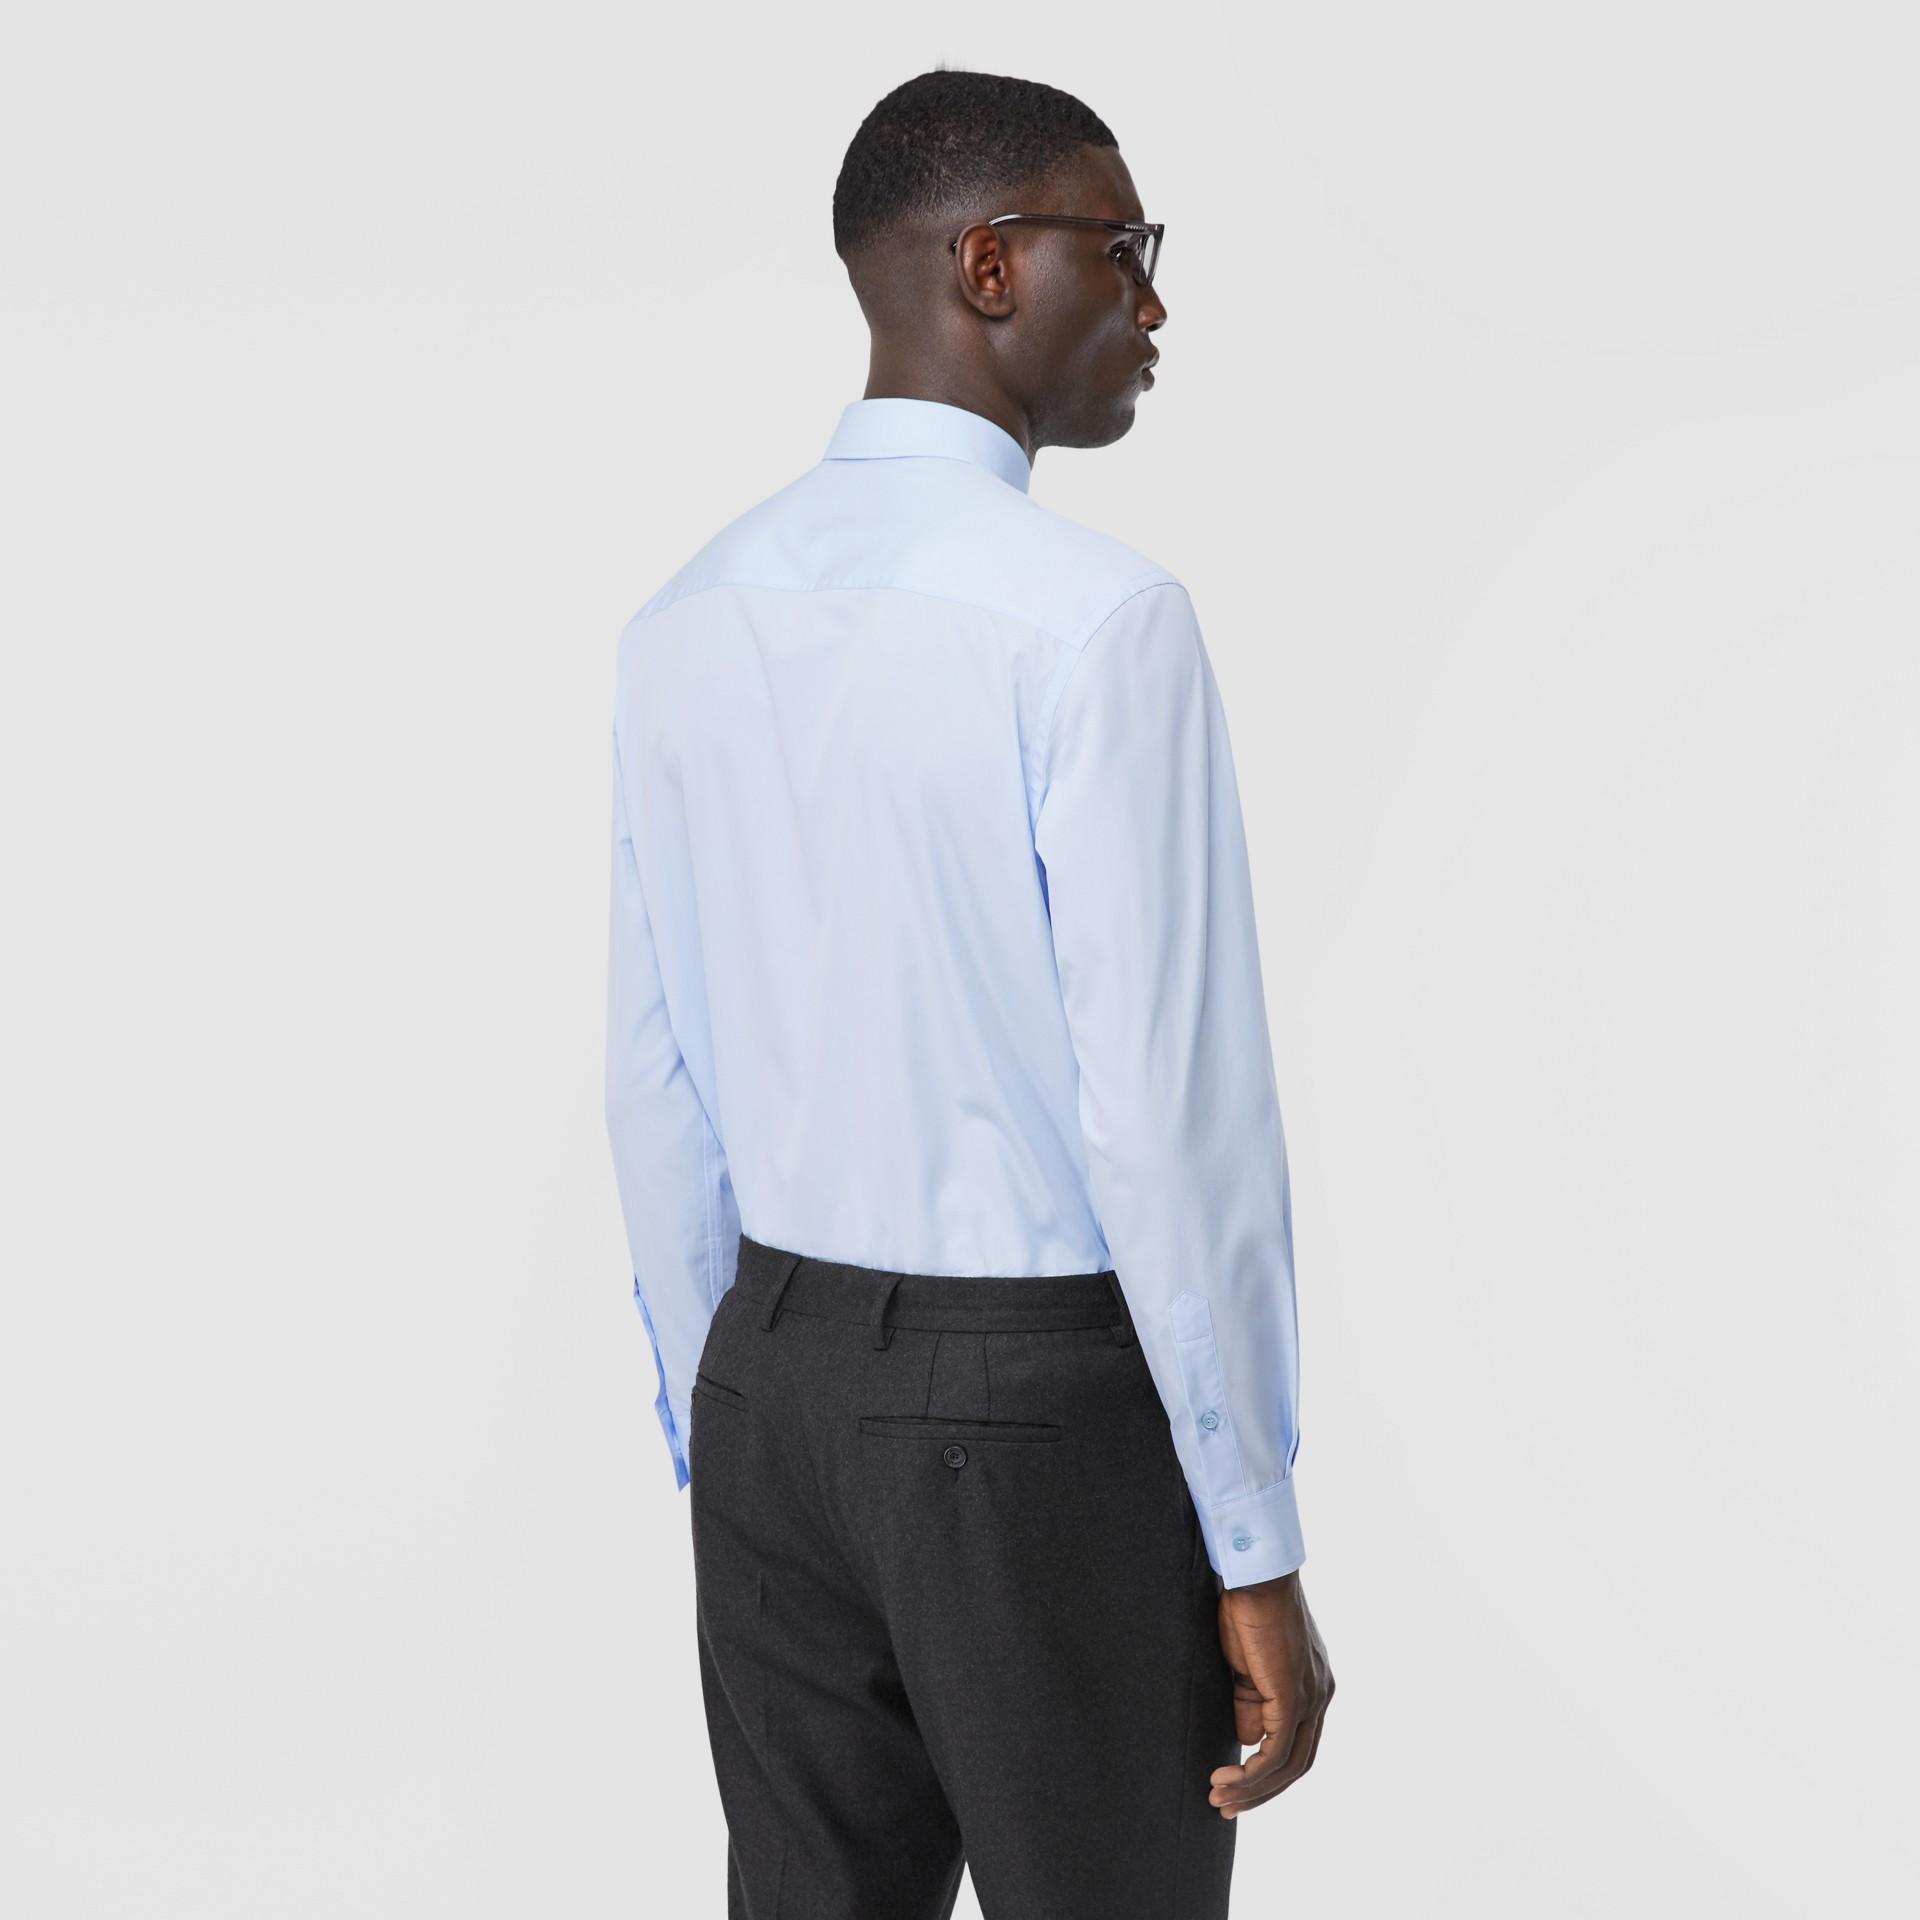 Classic Fit Monogram Motif Cotton Poplin Shirt in Pale Blue - Men | Burberry Singapore - gallery image 2